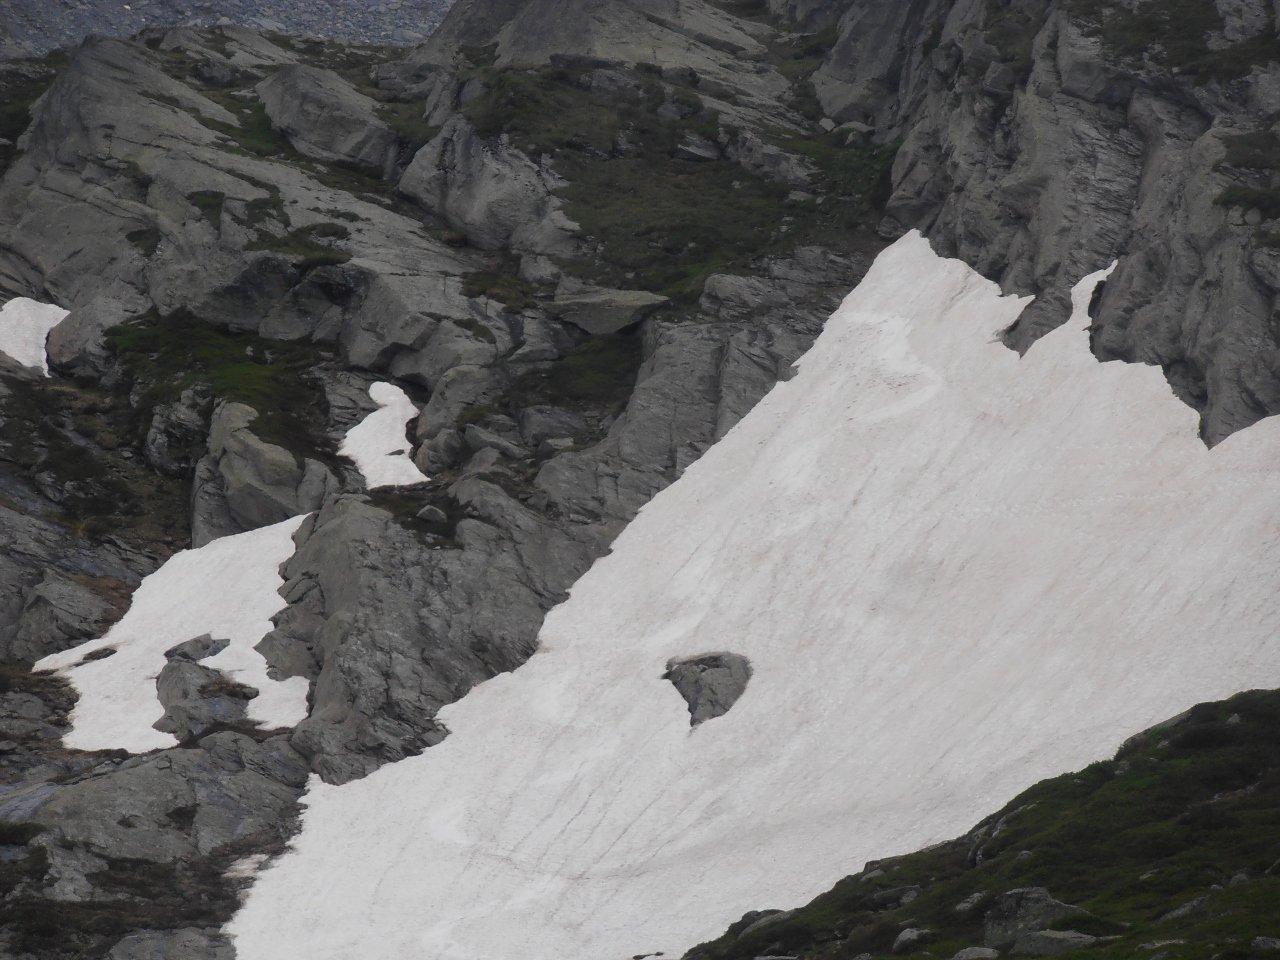 09 -curvoni a 35 gradi su nevai residui e discontinui fino a 2400